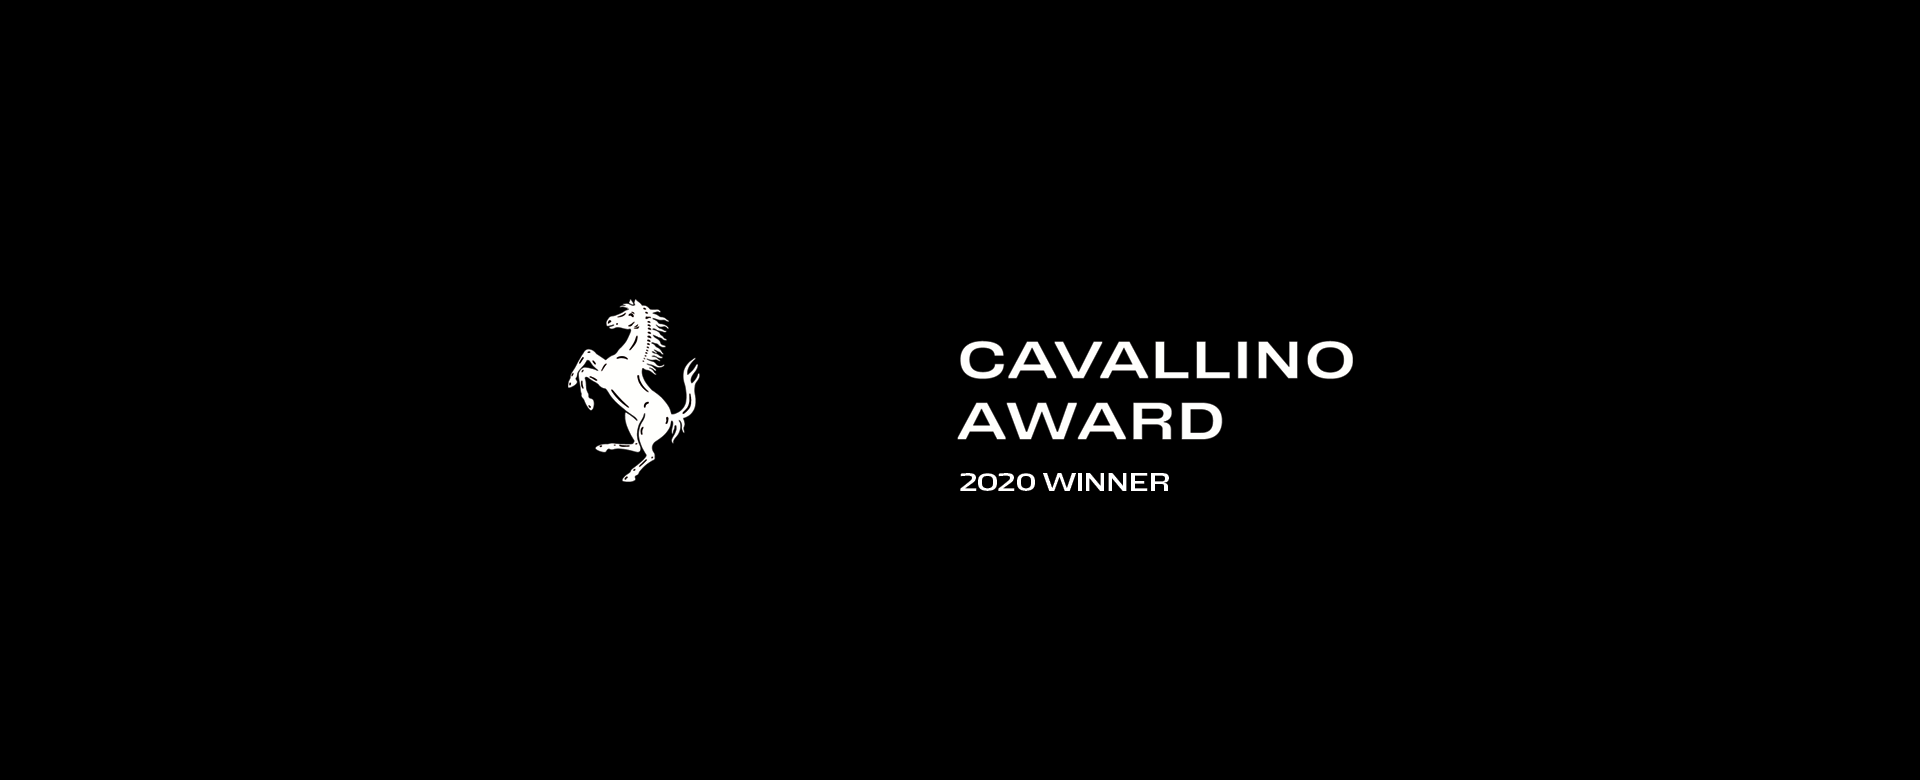 CavallinoAward